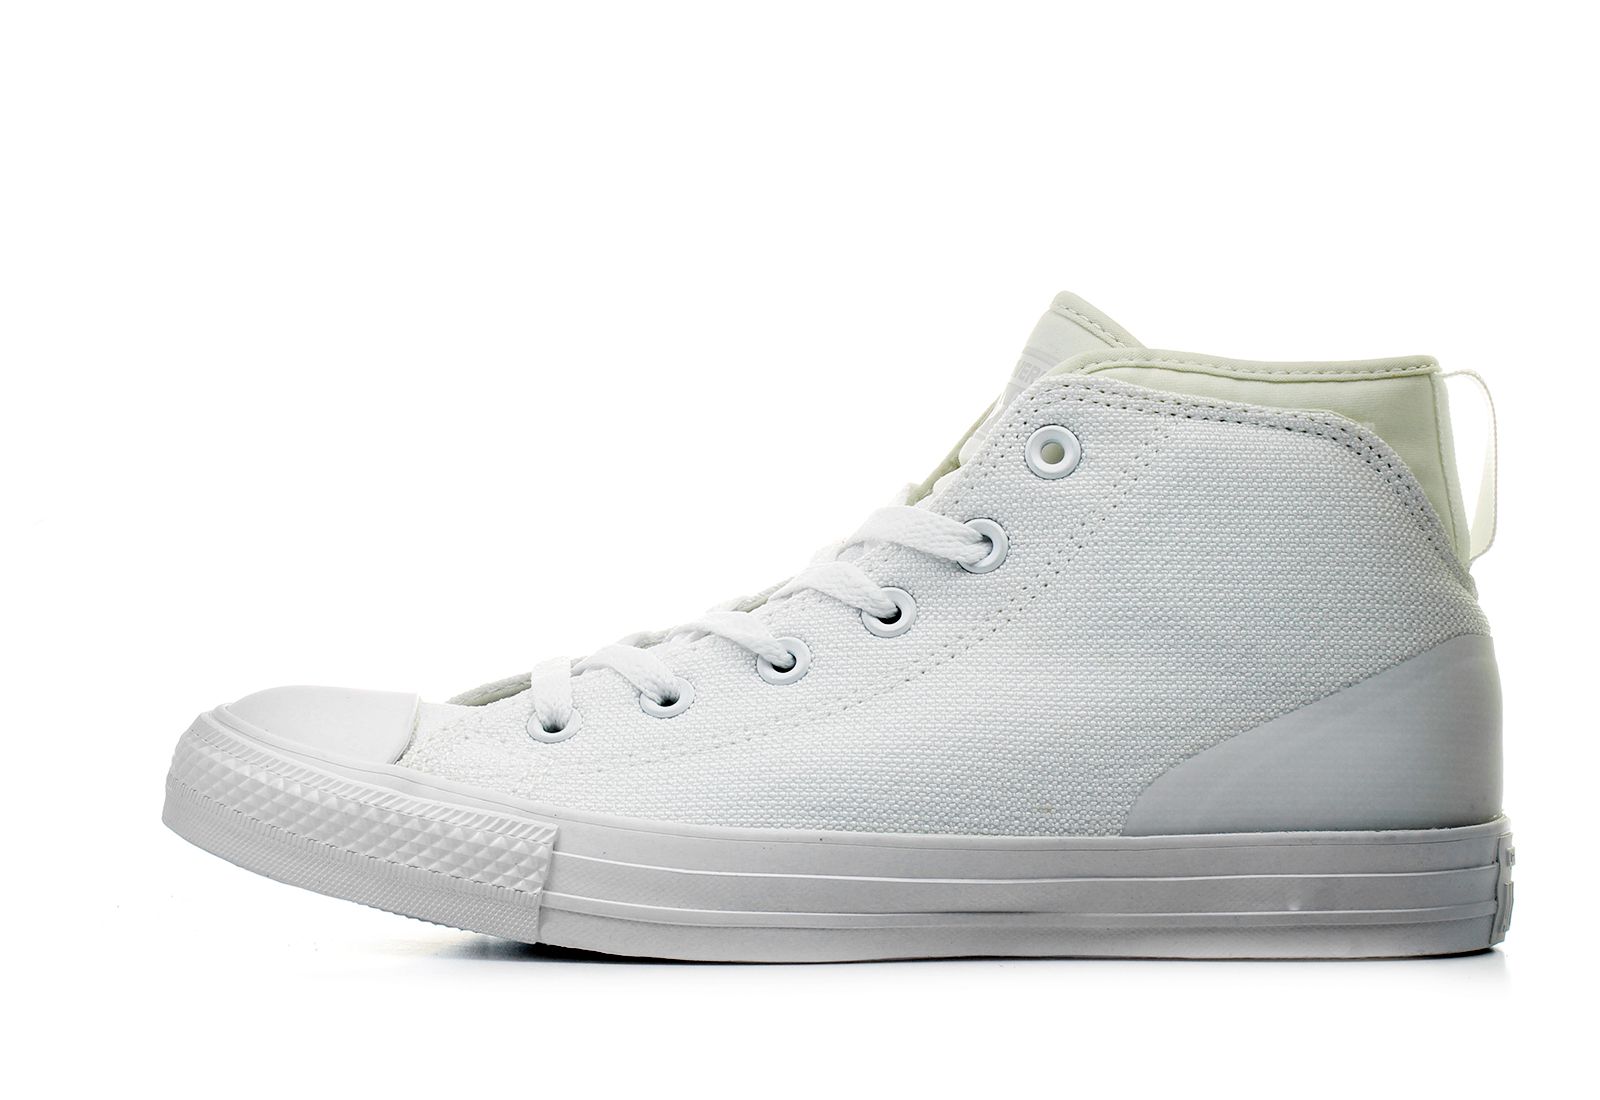 Converse Tenisky - Chuck Taylor All Star Syde Street - 155490C ... d5a3adf7520